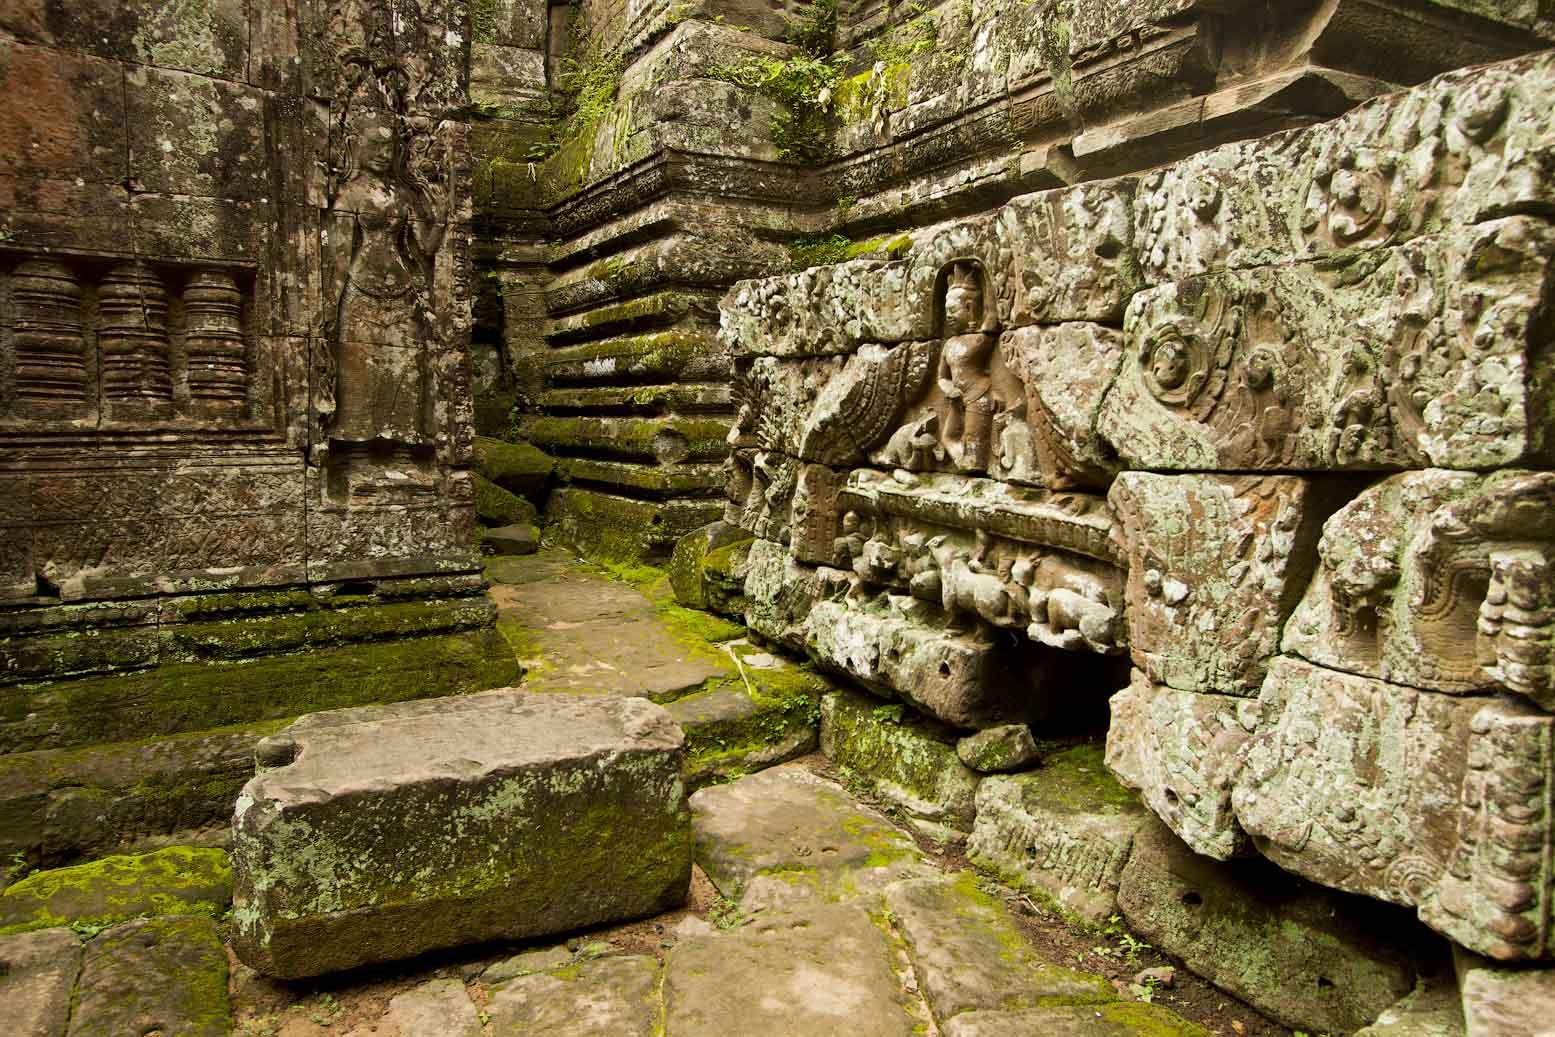 камбоджа, ангкор, ват, азия, Артем Верхогляд